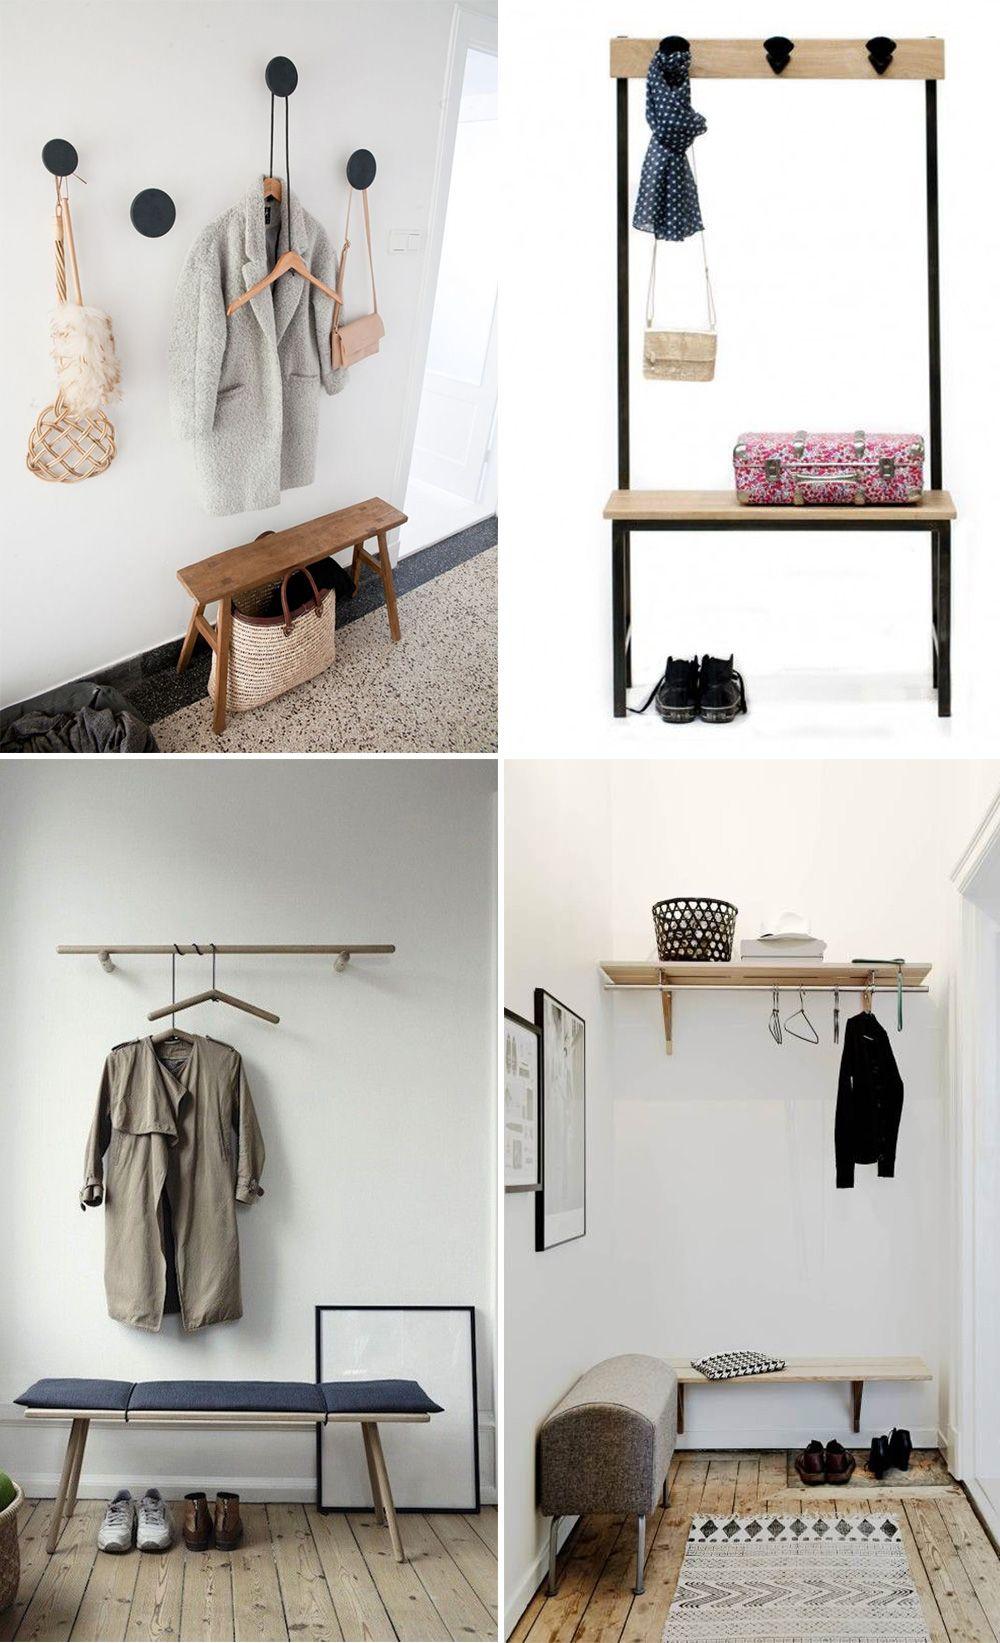 6 ides pour amnager une petite entre  elephant in the room  Astuces decoration  Dco